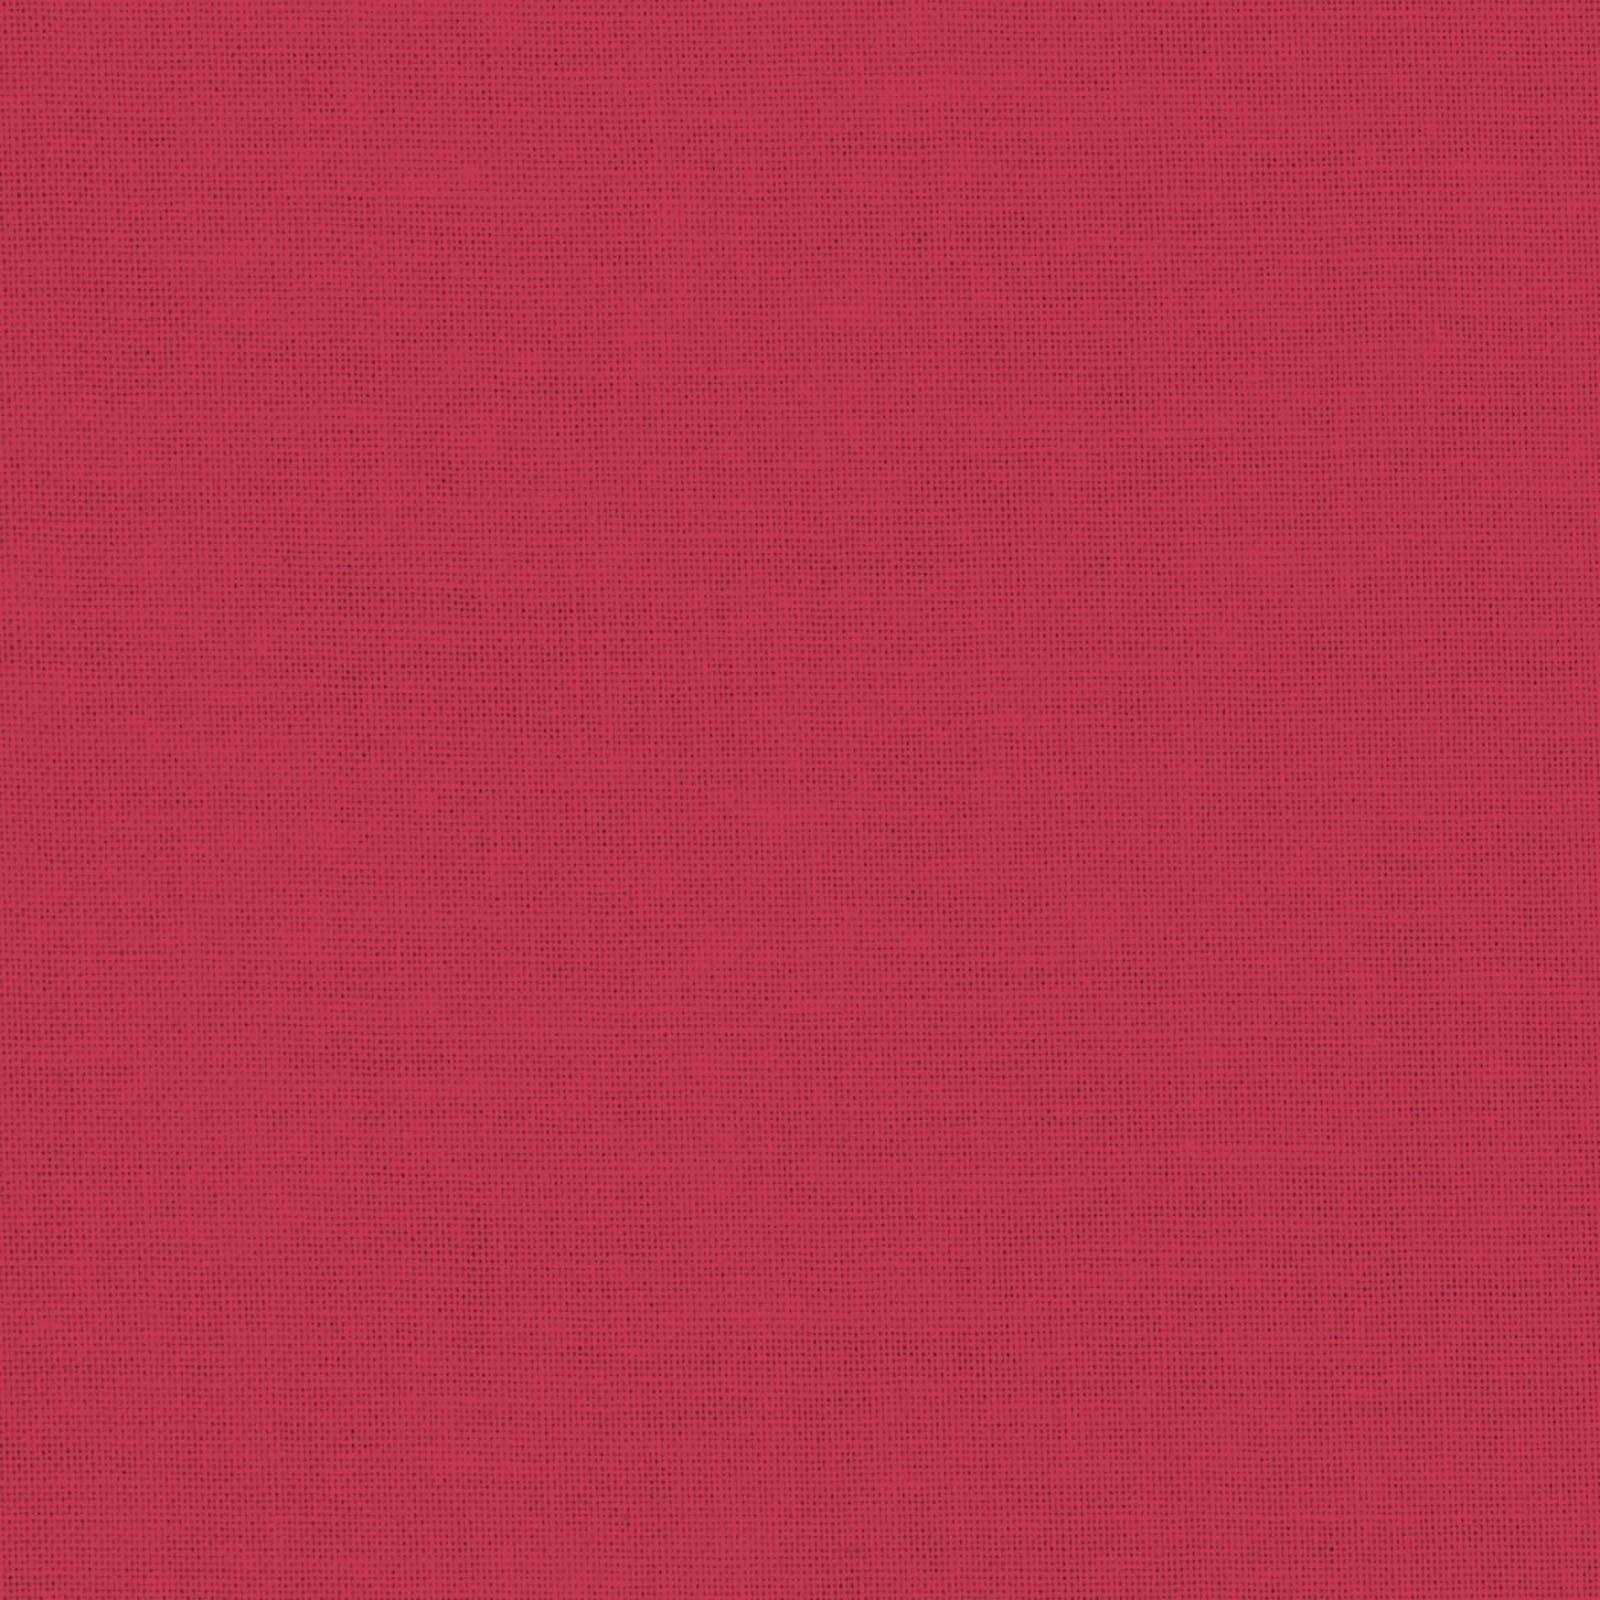 Solid - Sunset Ruby<br/>RJR 9617-357